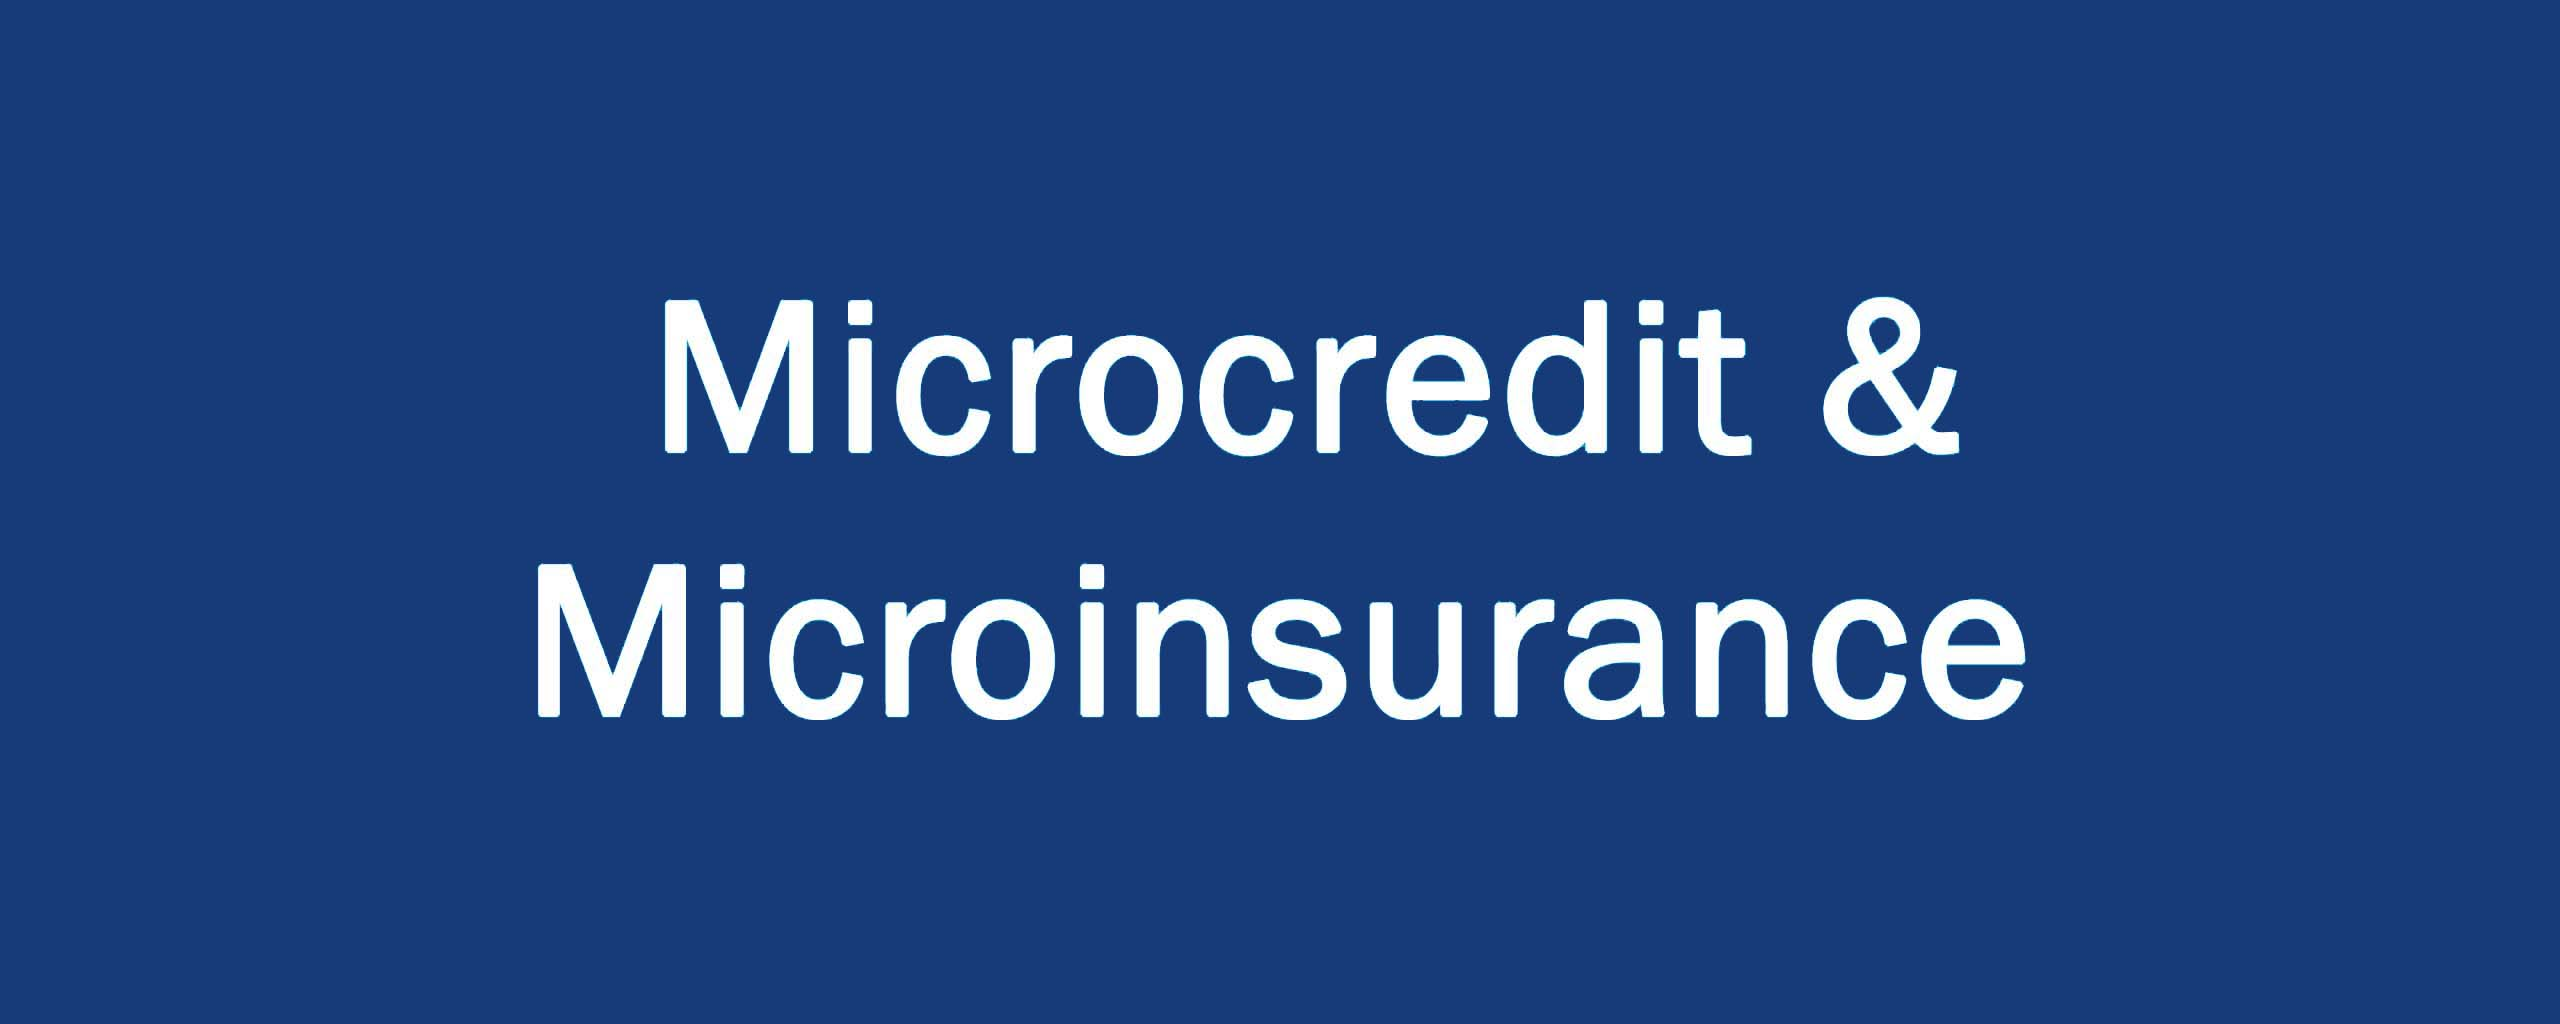 Microcredit & Microinsurance